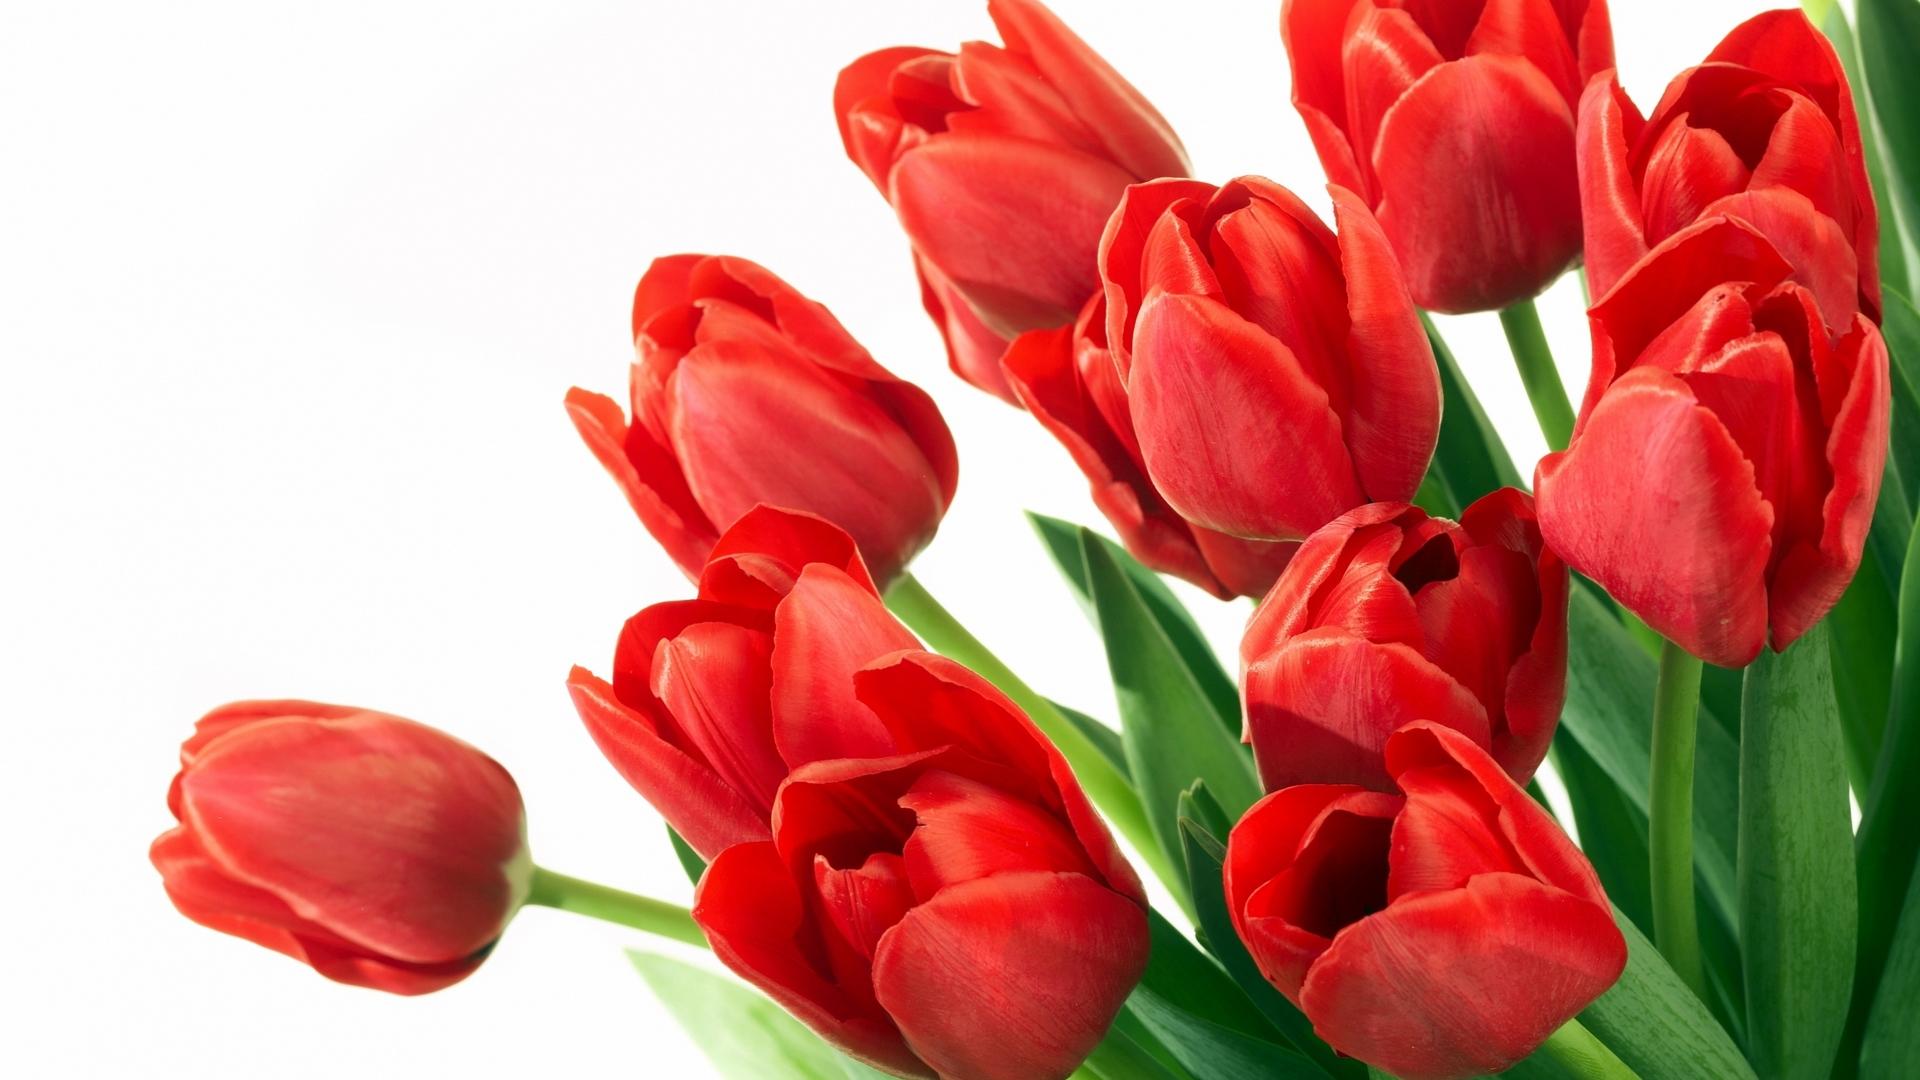 http://www.kartinki24.ru/uploads/gallery/main/207/k669k9sqhx.jpg